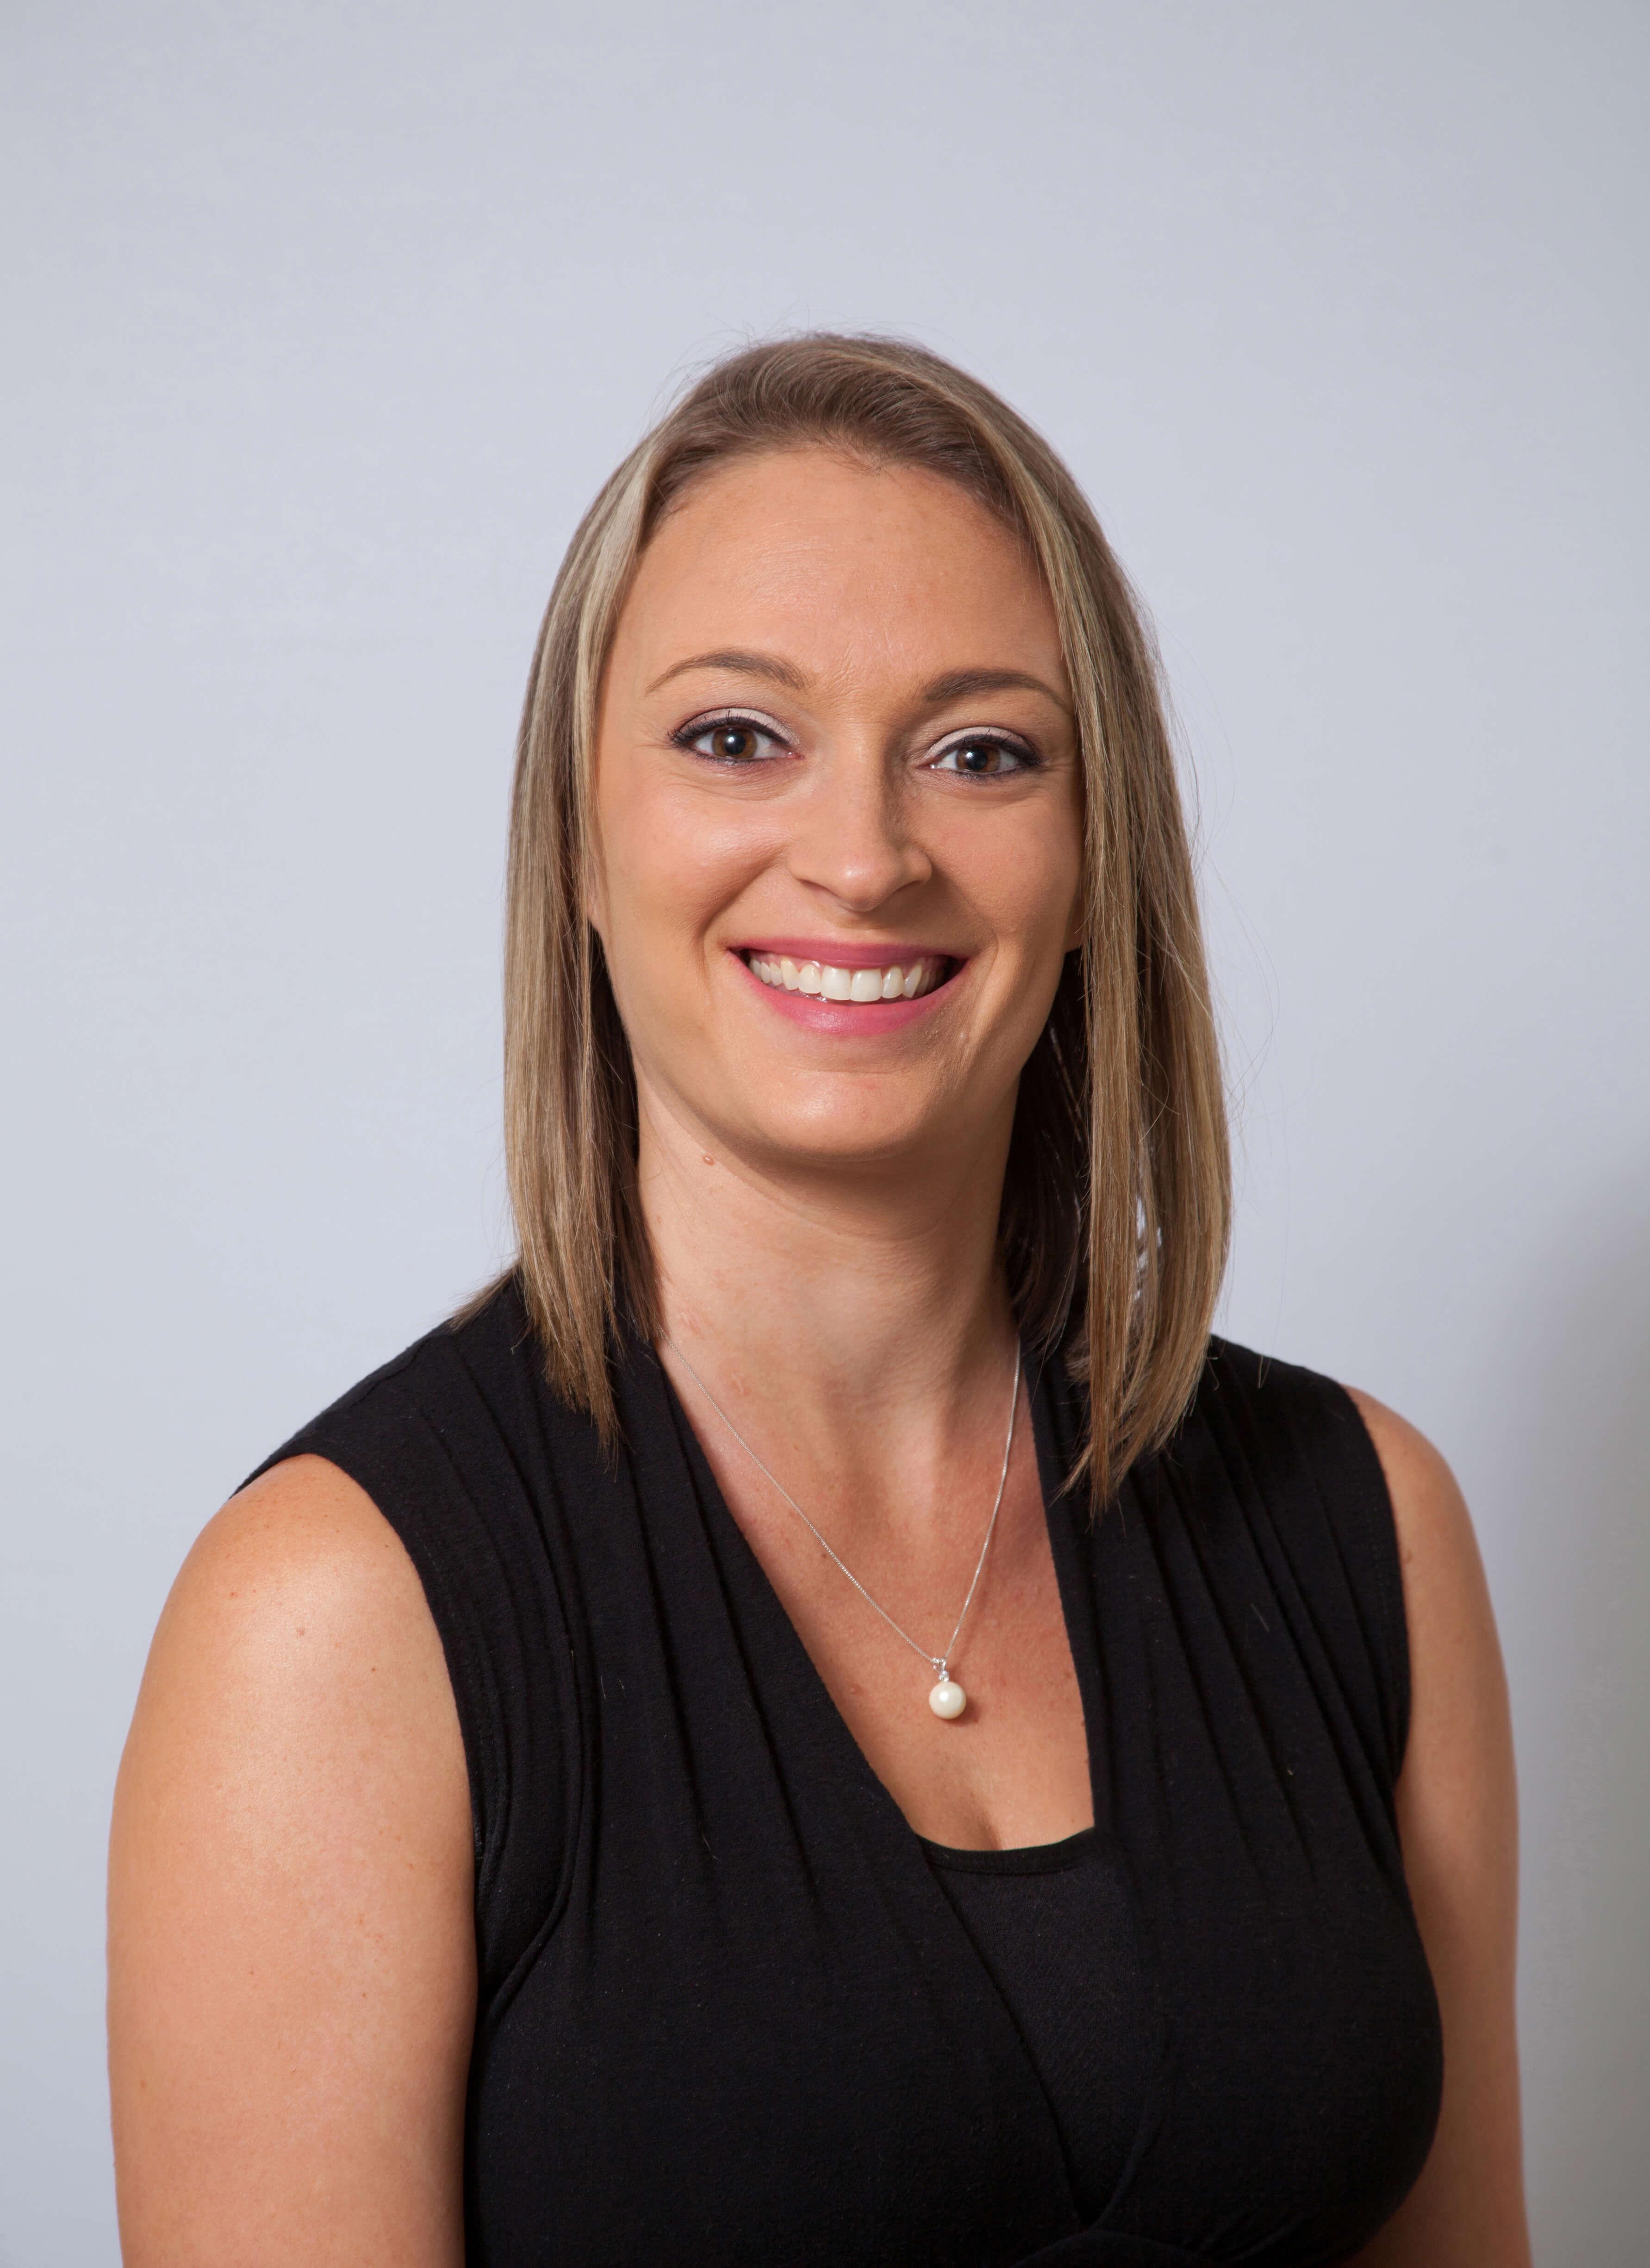 Stephanie Gaulter